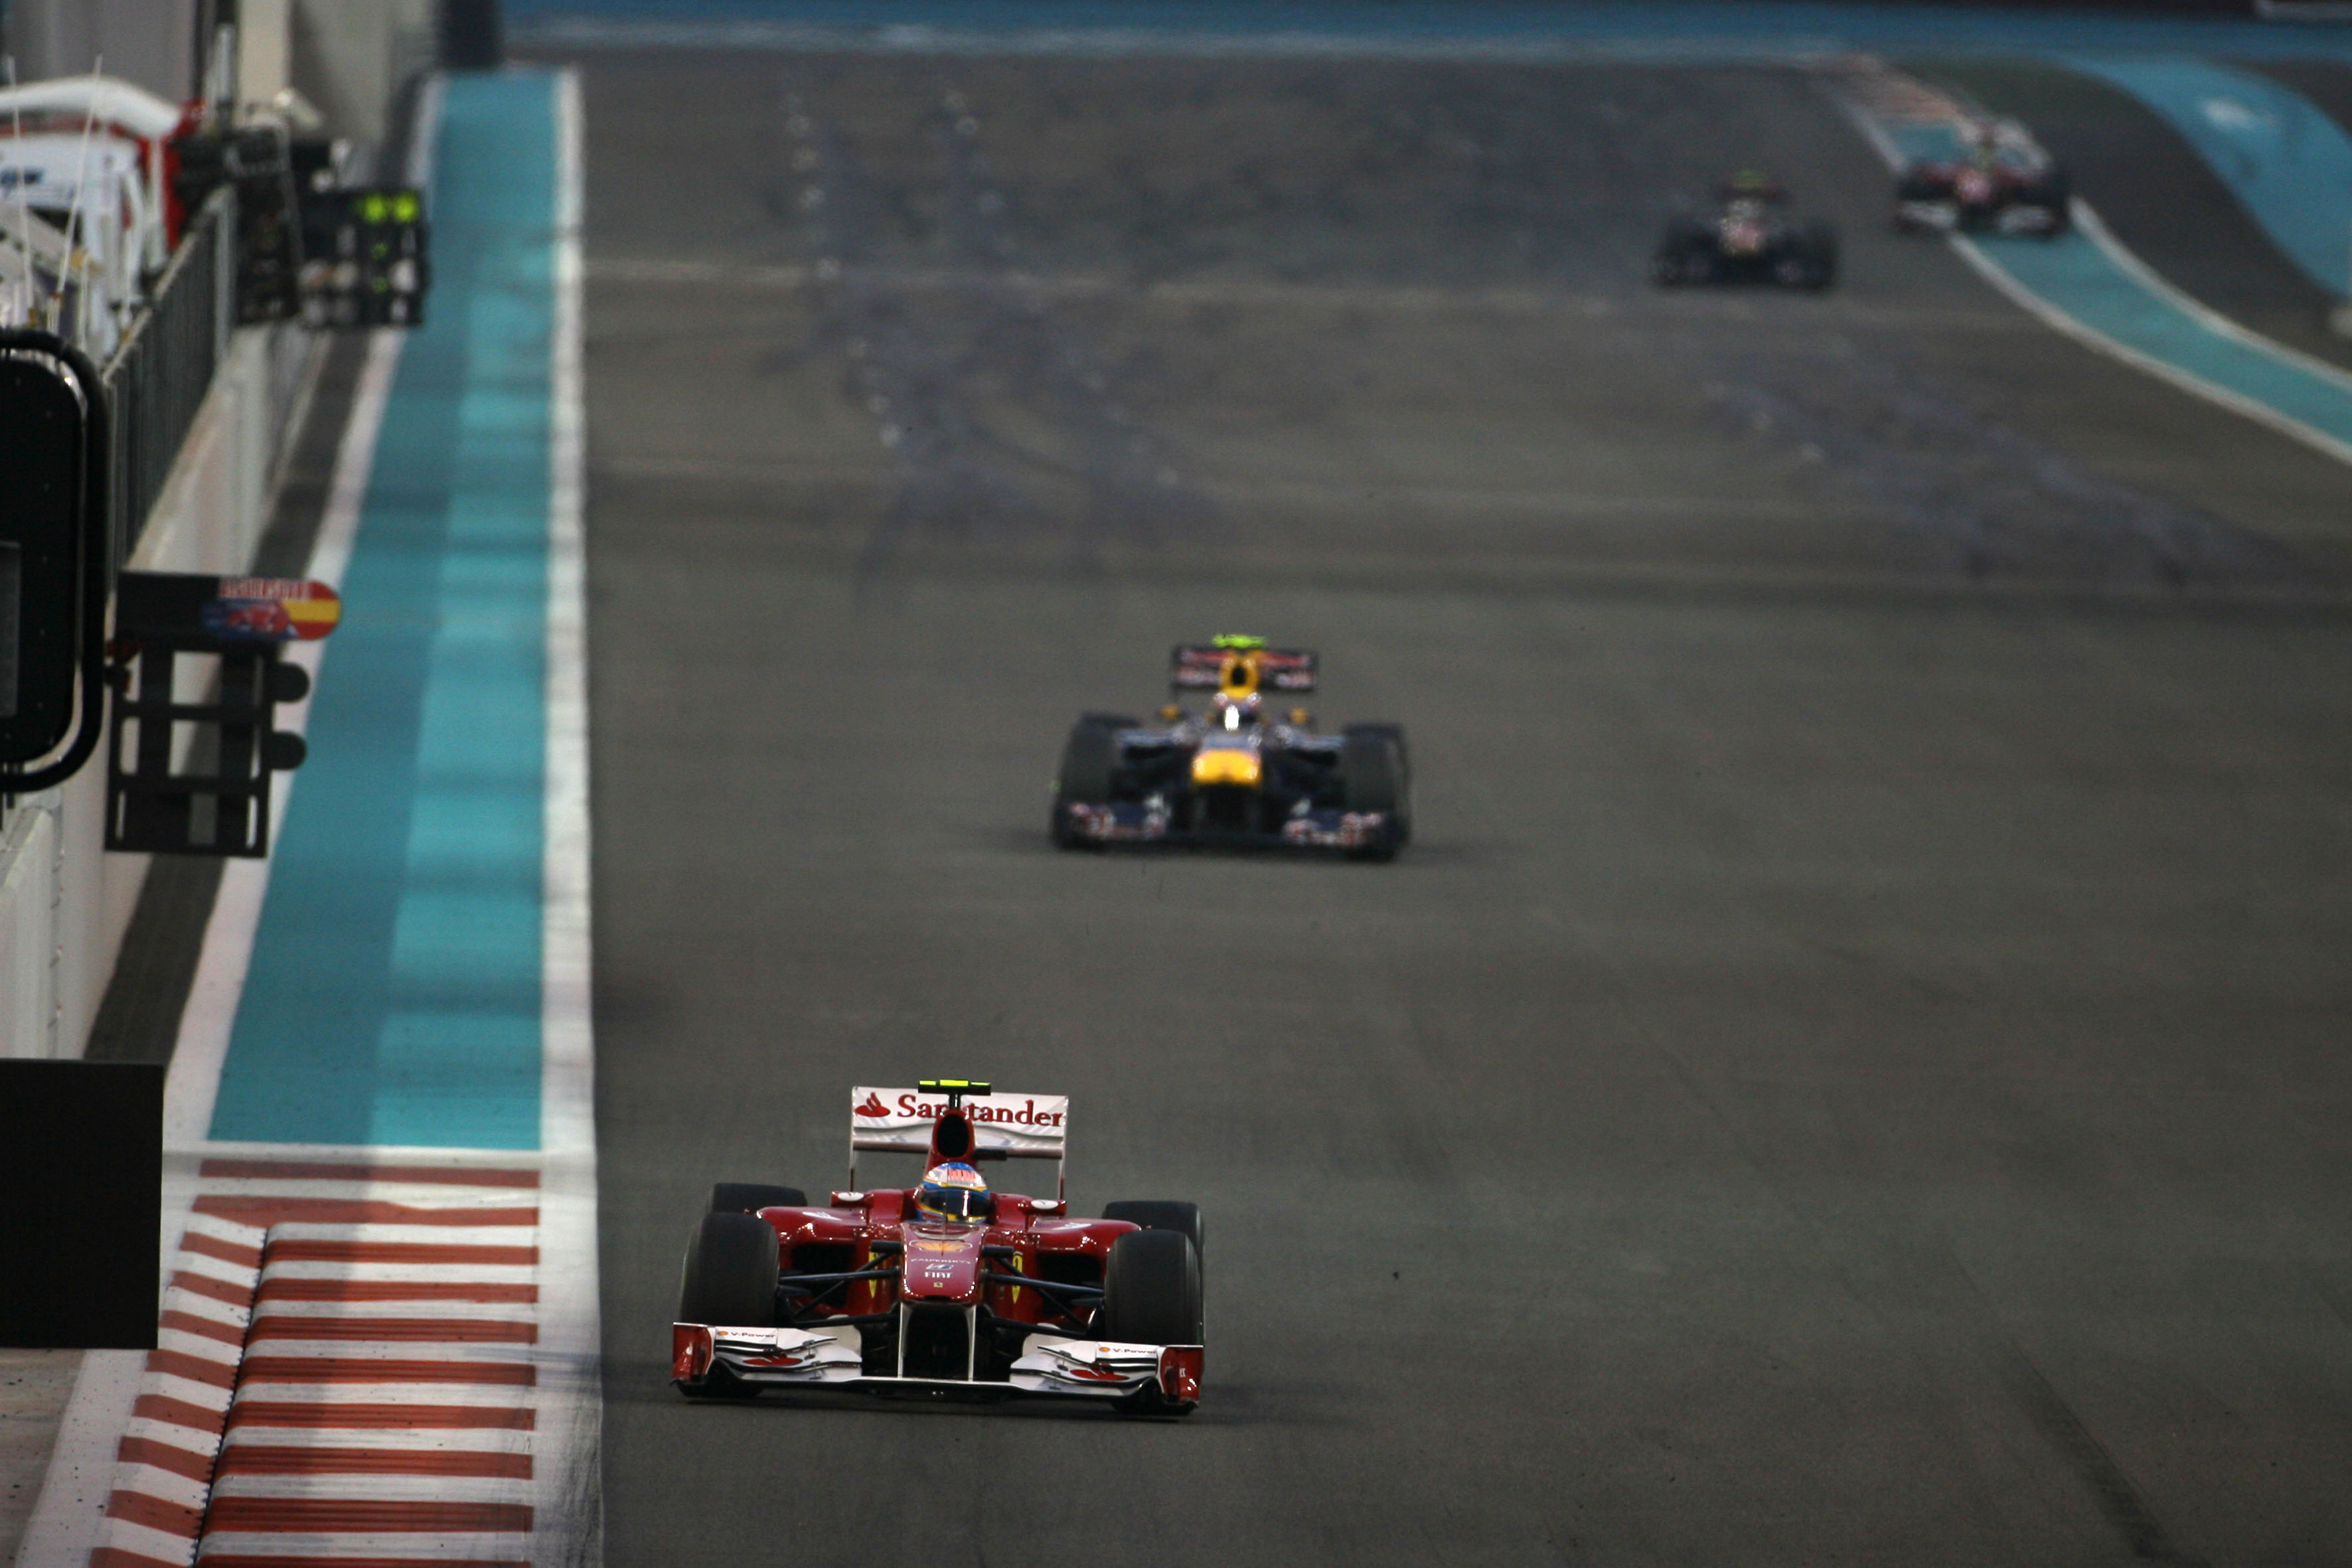 Formula 1 Grand Prix, Abu Dhabi, Sunday Race